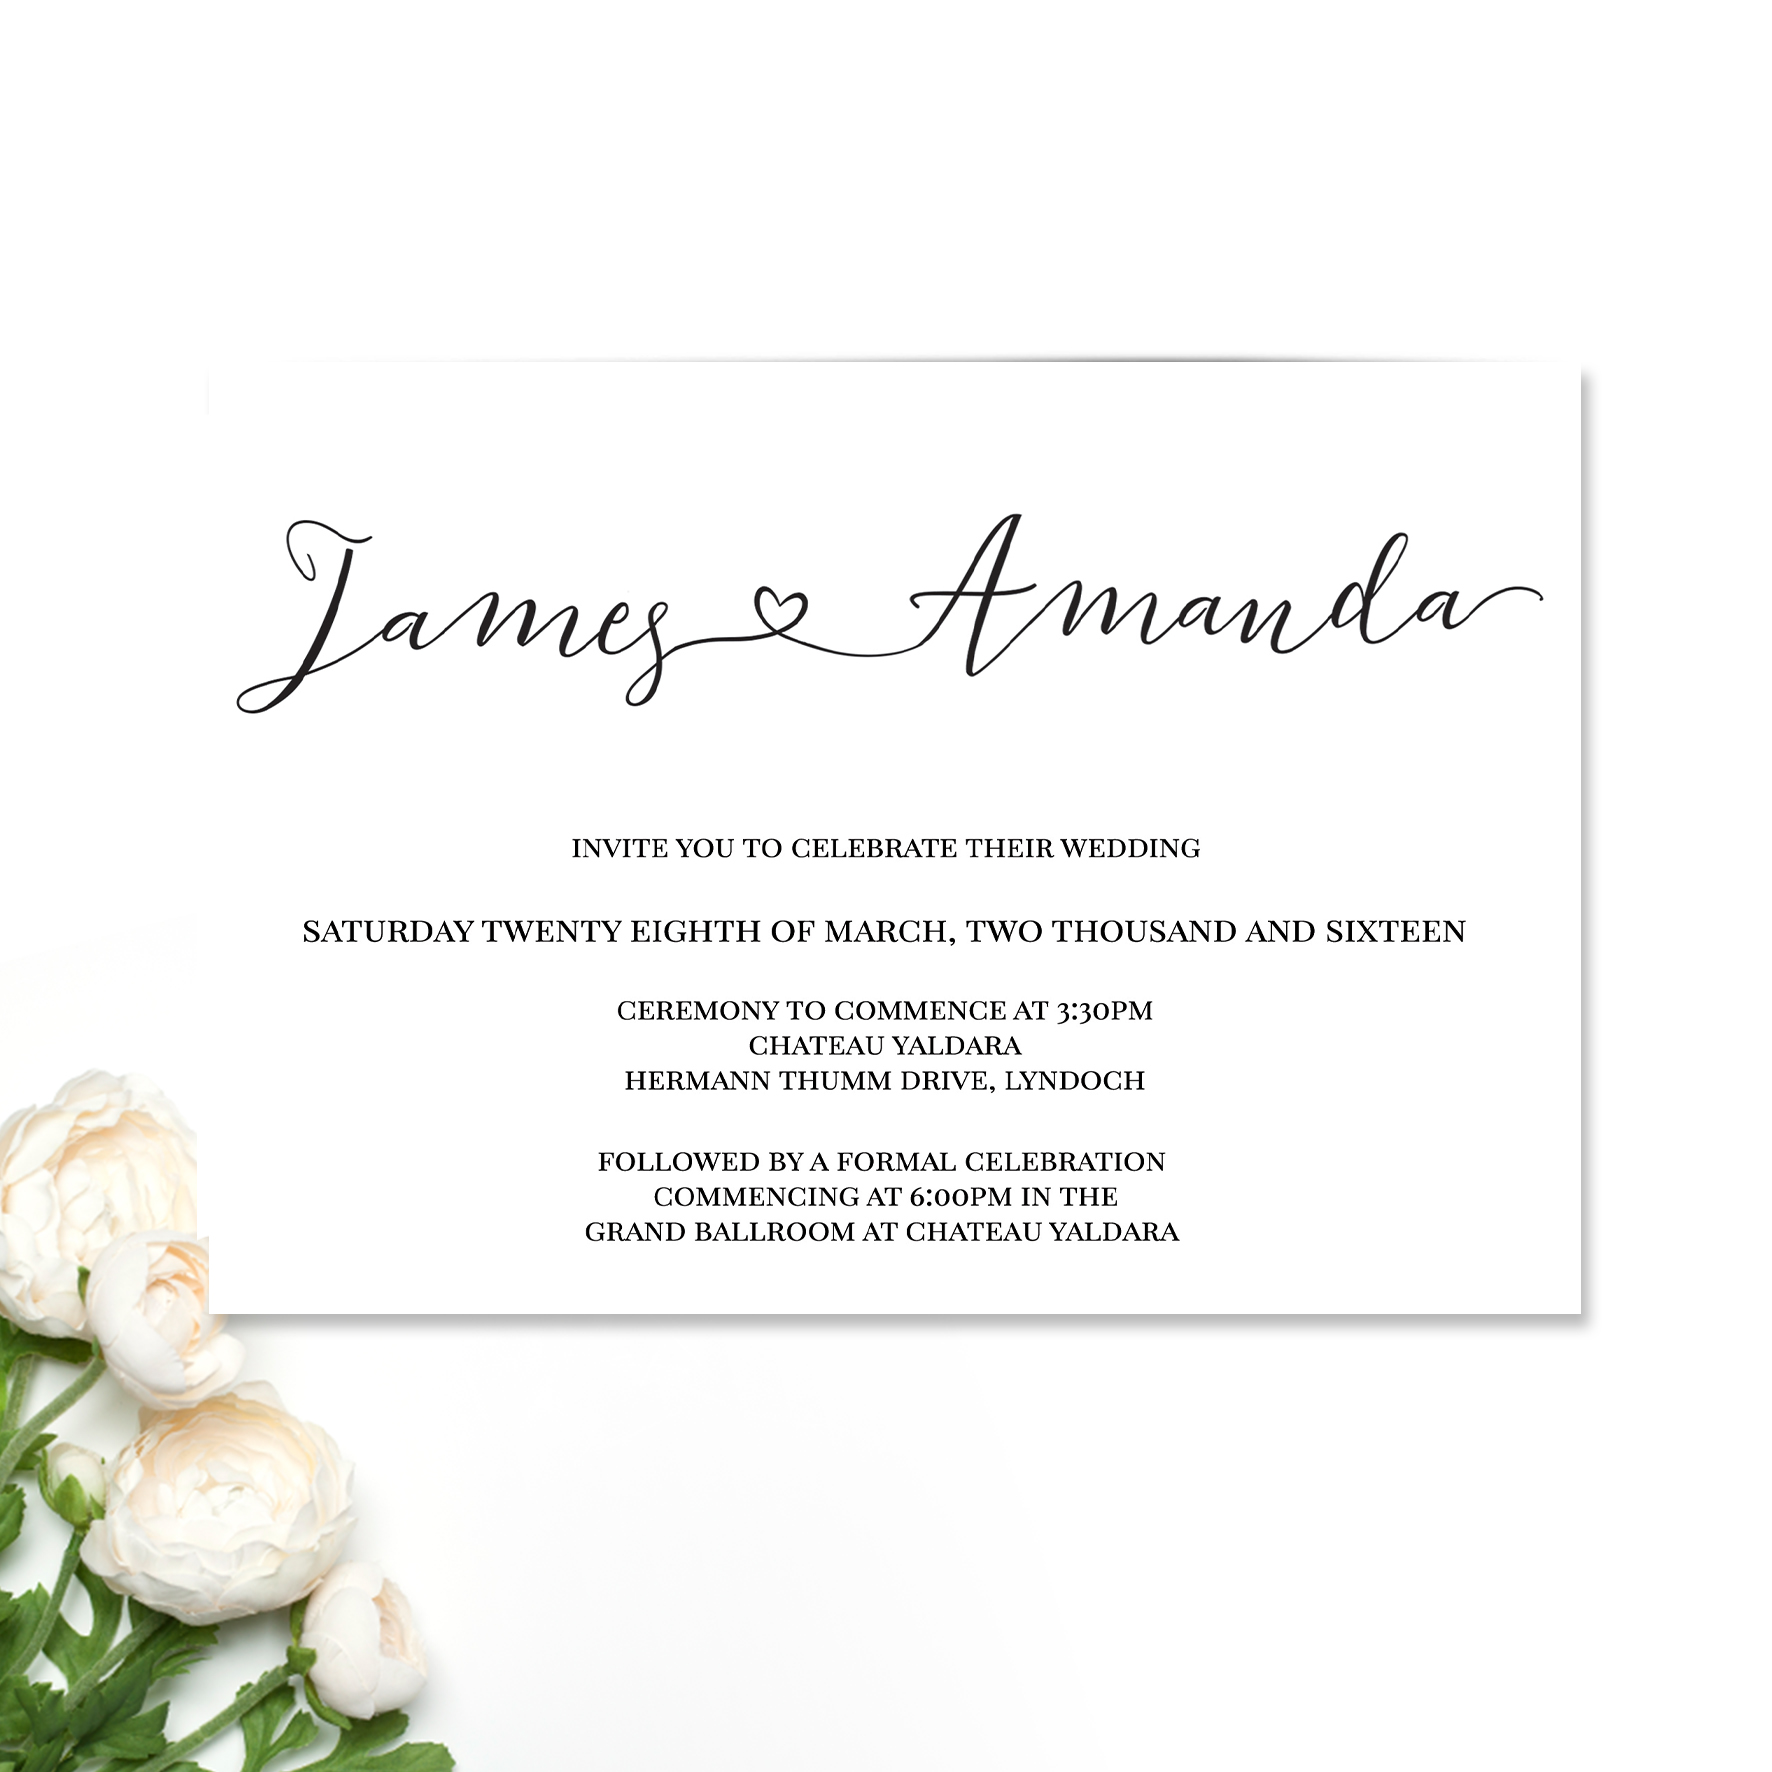 James + Amanda Wedding Invitation